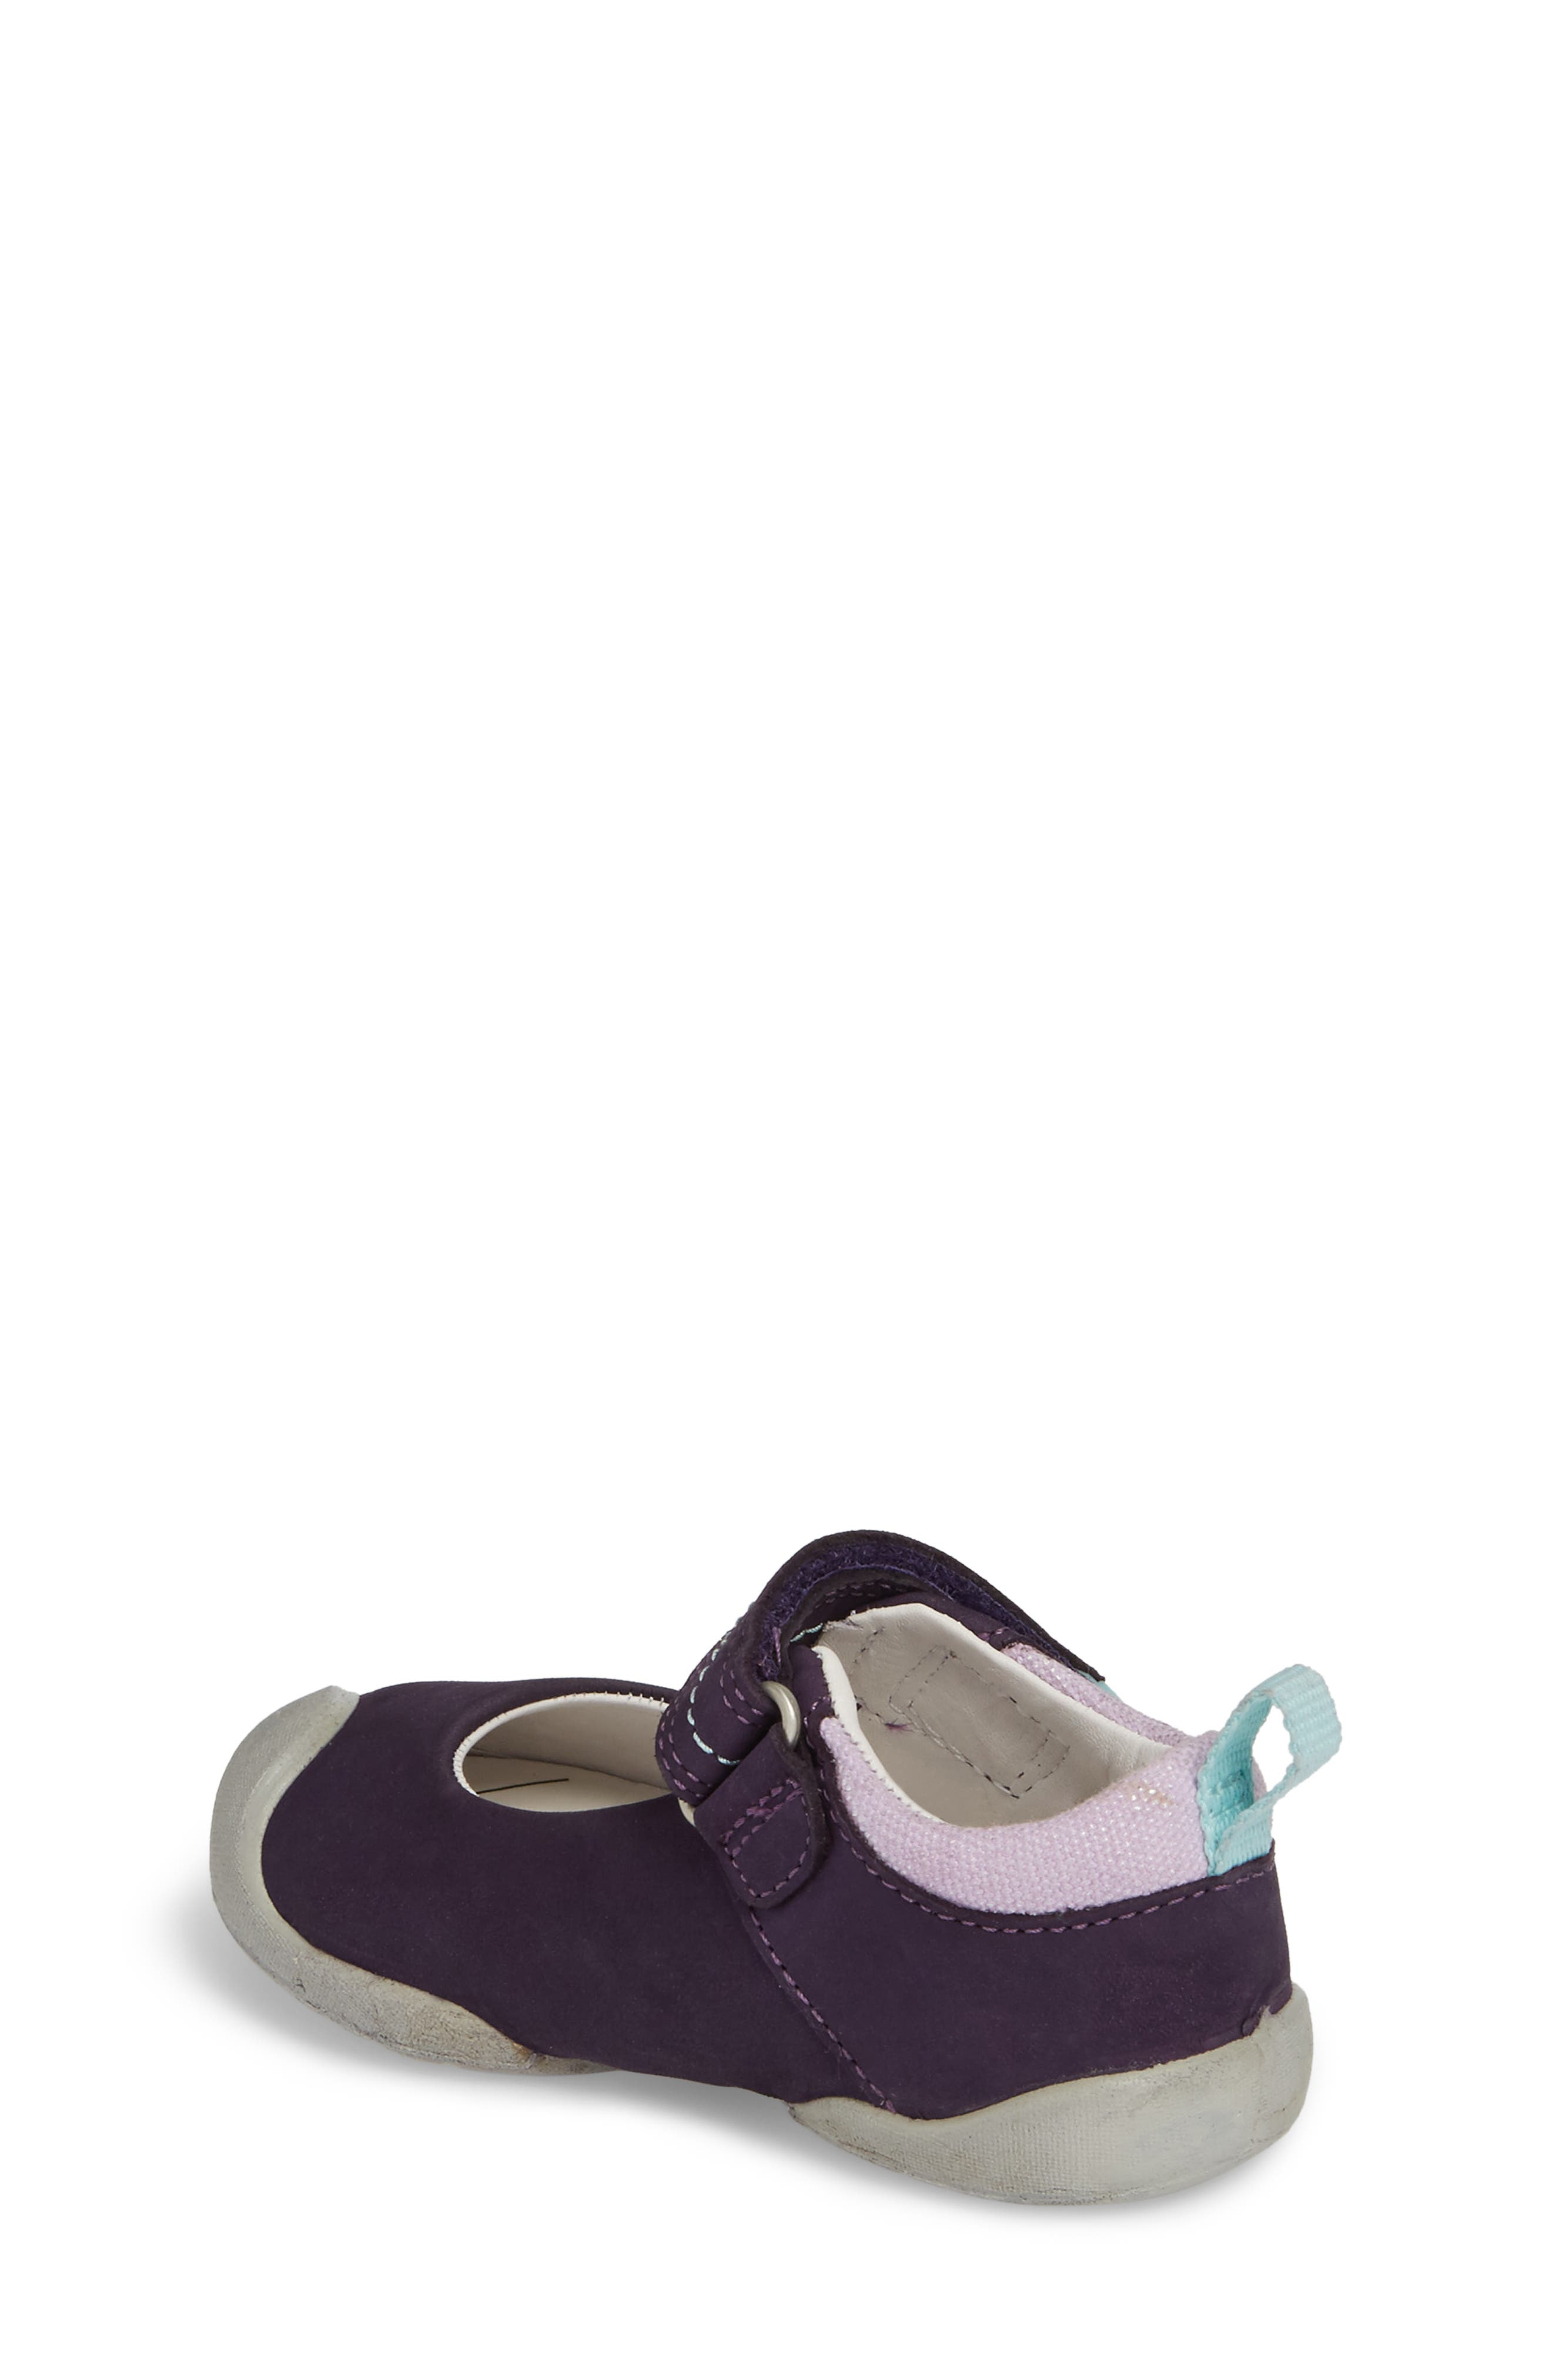 Pep Mary Jane-T Sneaker,                             Alternate thumbnail 4, color,